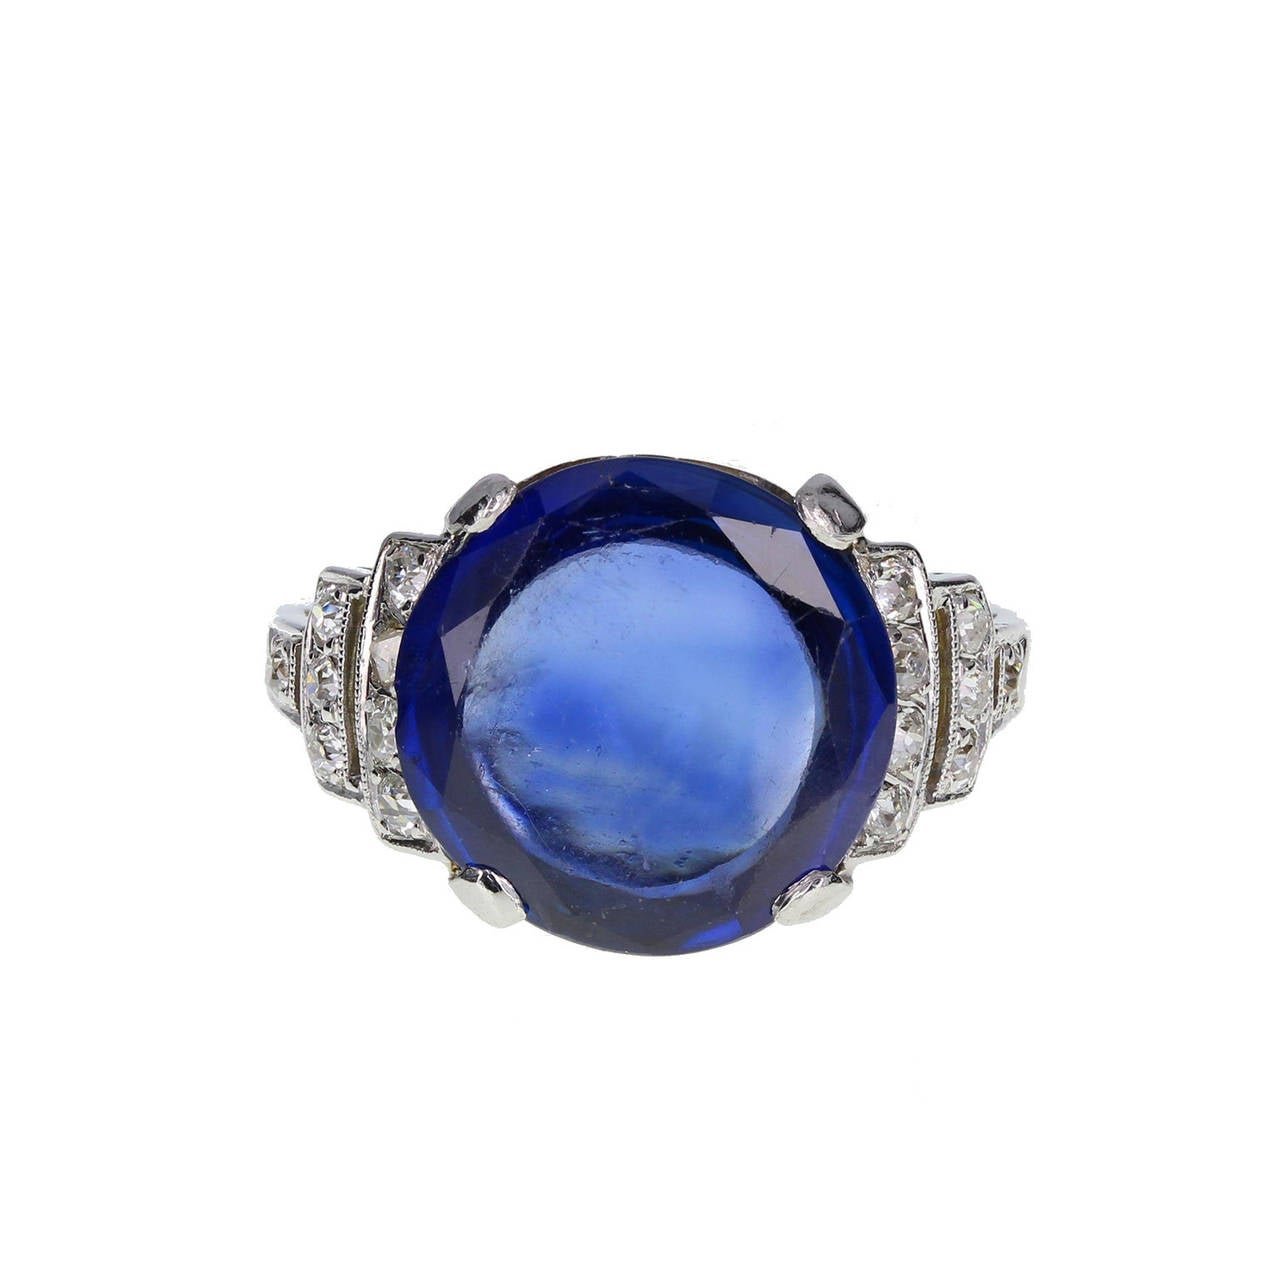 Art Deco Fancy Cut 6.21 Carat Sapphire Diamond Platinum Ring